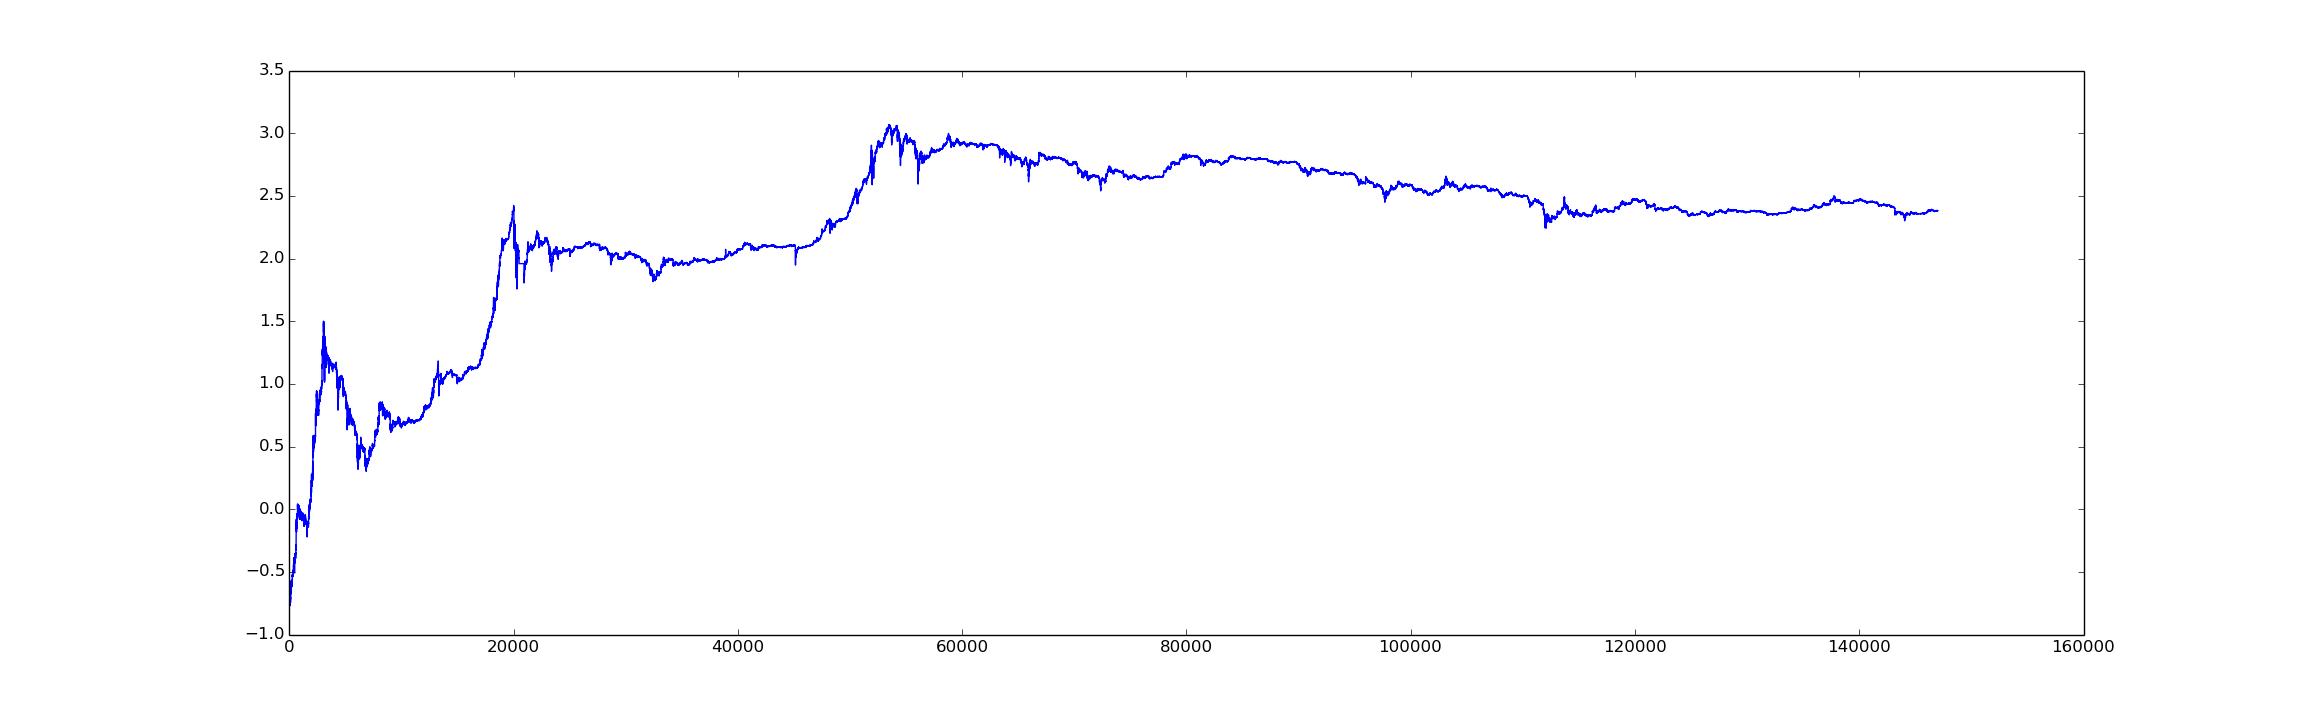 Bitcoin historical price data csv python / Bitcoin company